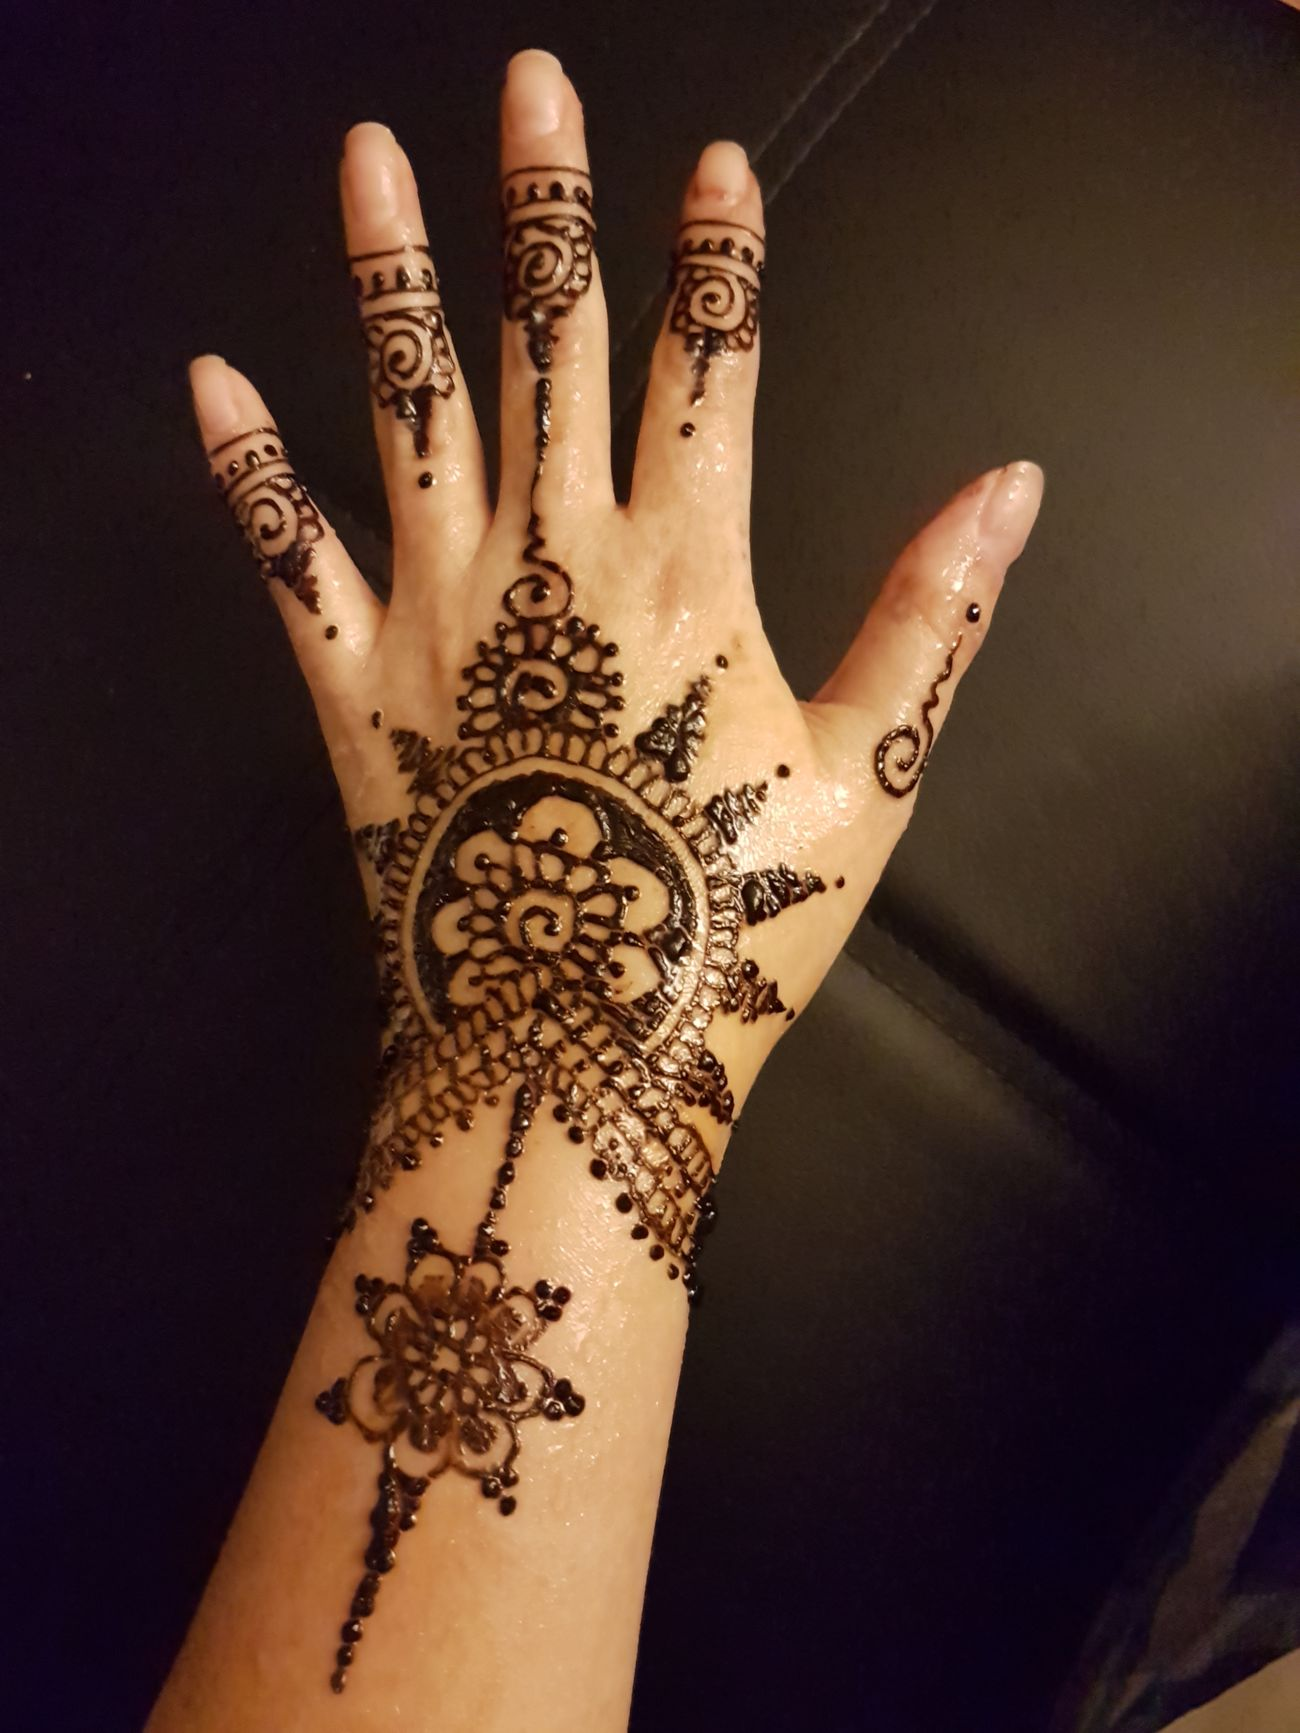 Human Body Part Arts Culture And Entertainment Body Adornment Punjabiculture Creativity Art And Craft Human Skin Henna Tattoo Human Finger Punjabistyle MehndiDesign Culture My Work Mehndi MehndiTattoos Design Tattoo